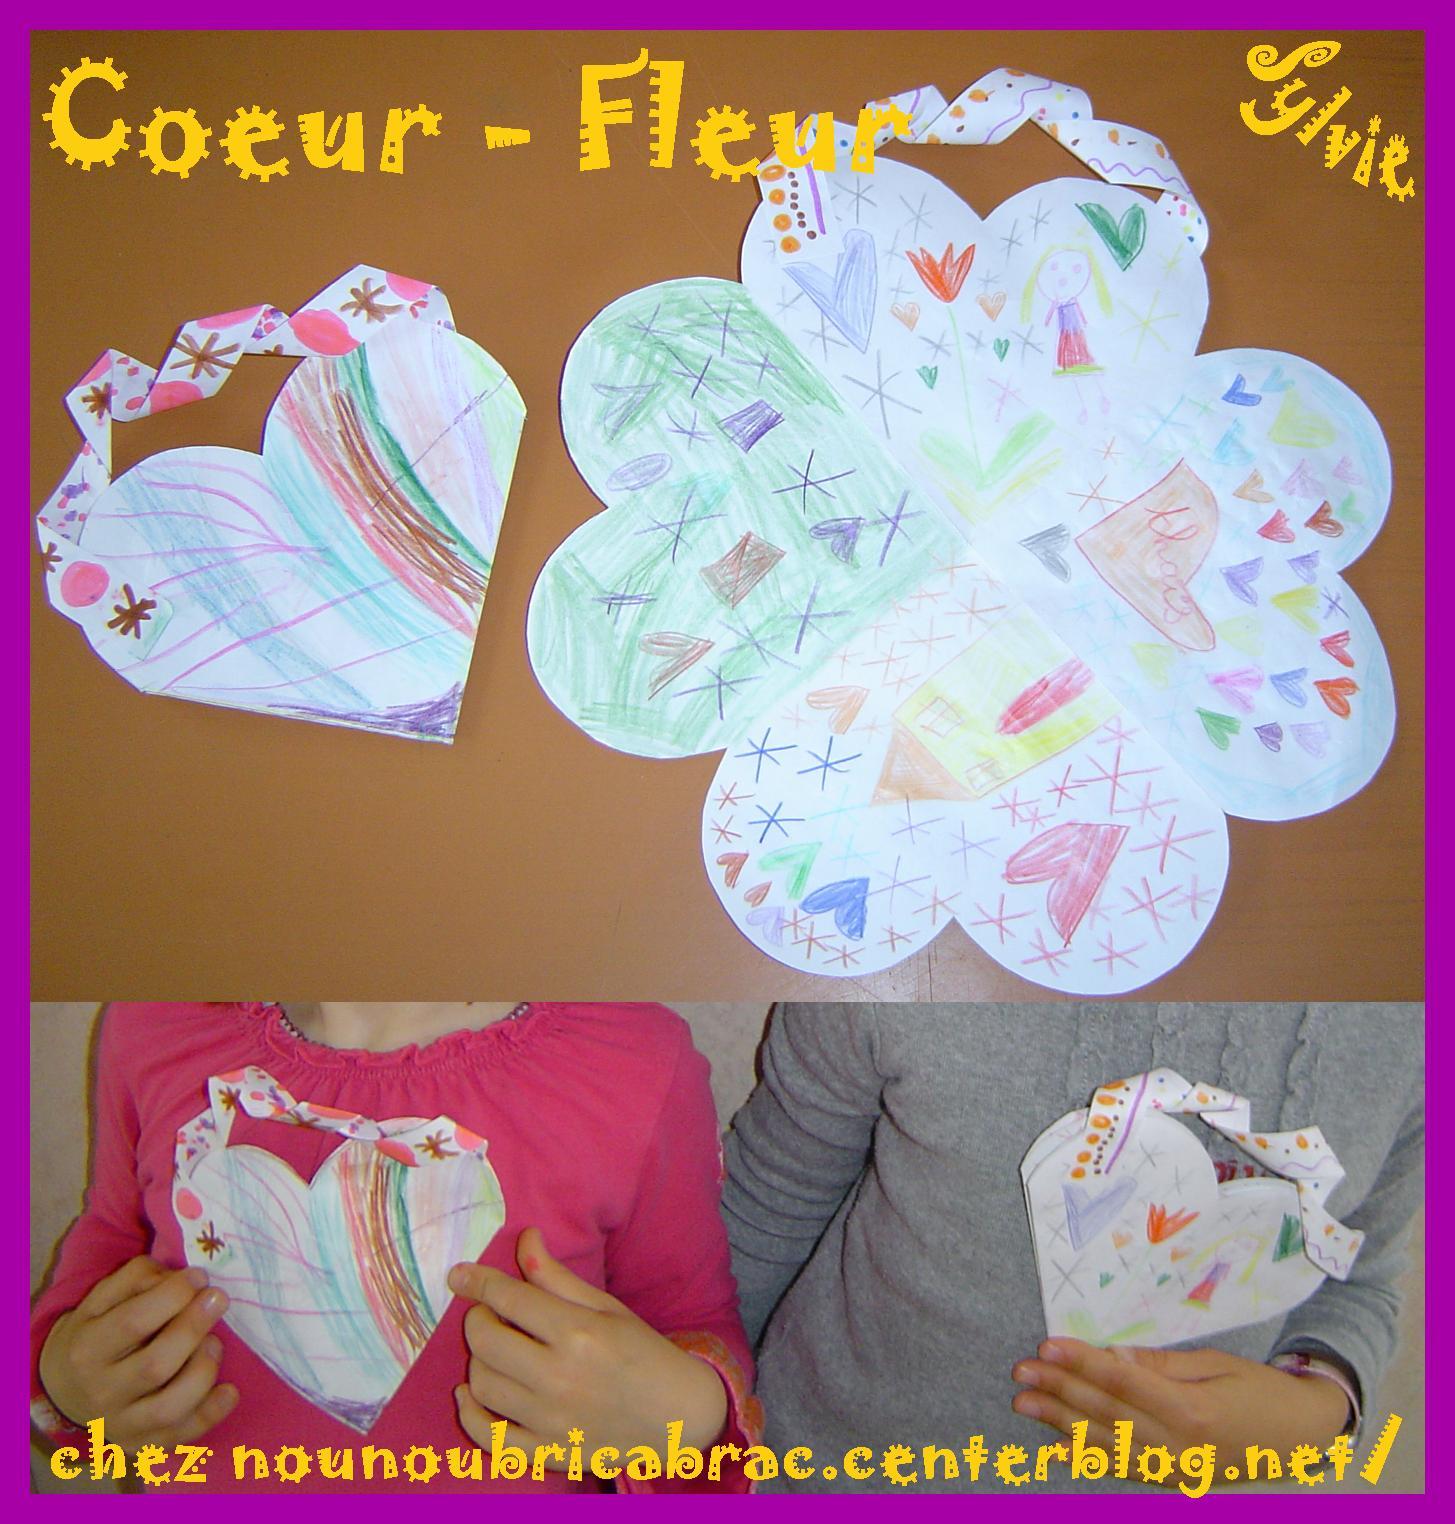 Carte Coeur Fleur... pour offrir à sa maman